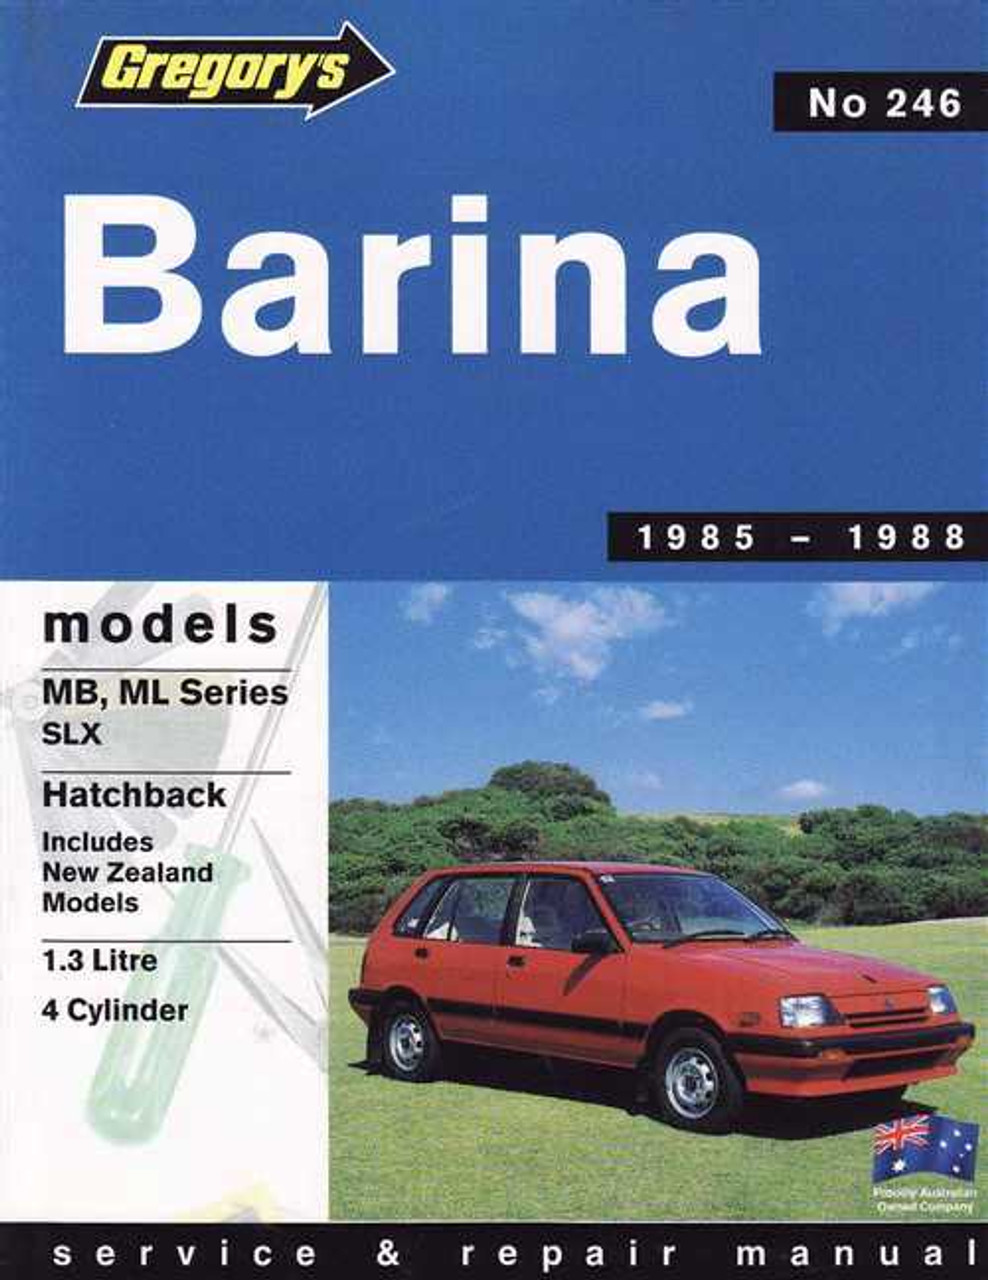 holden barina 1985 1988 workshop manual rh automotobookshop com au Nissan Pulsar Holden Barina Icon